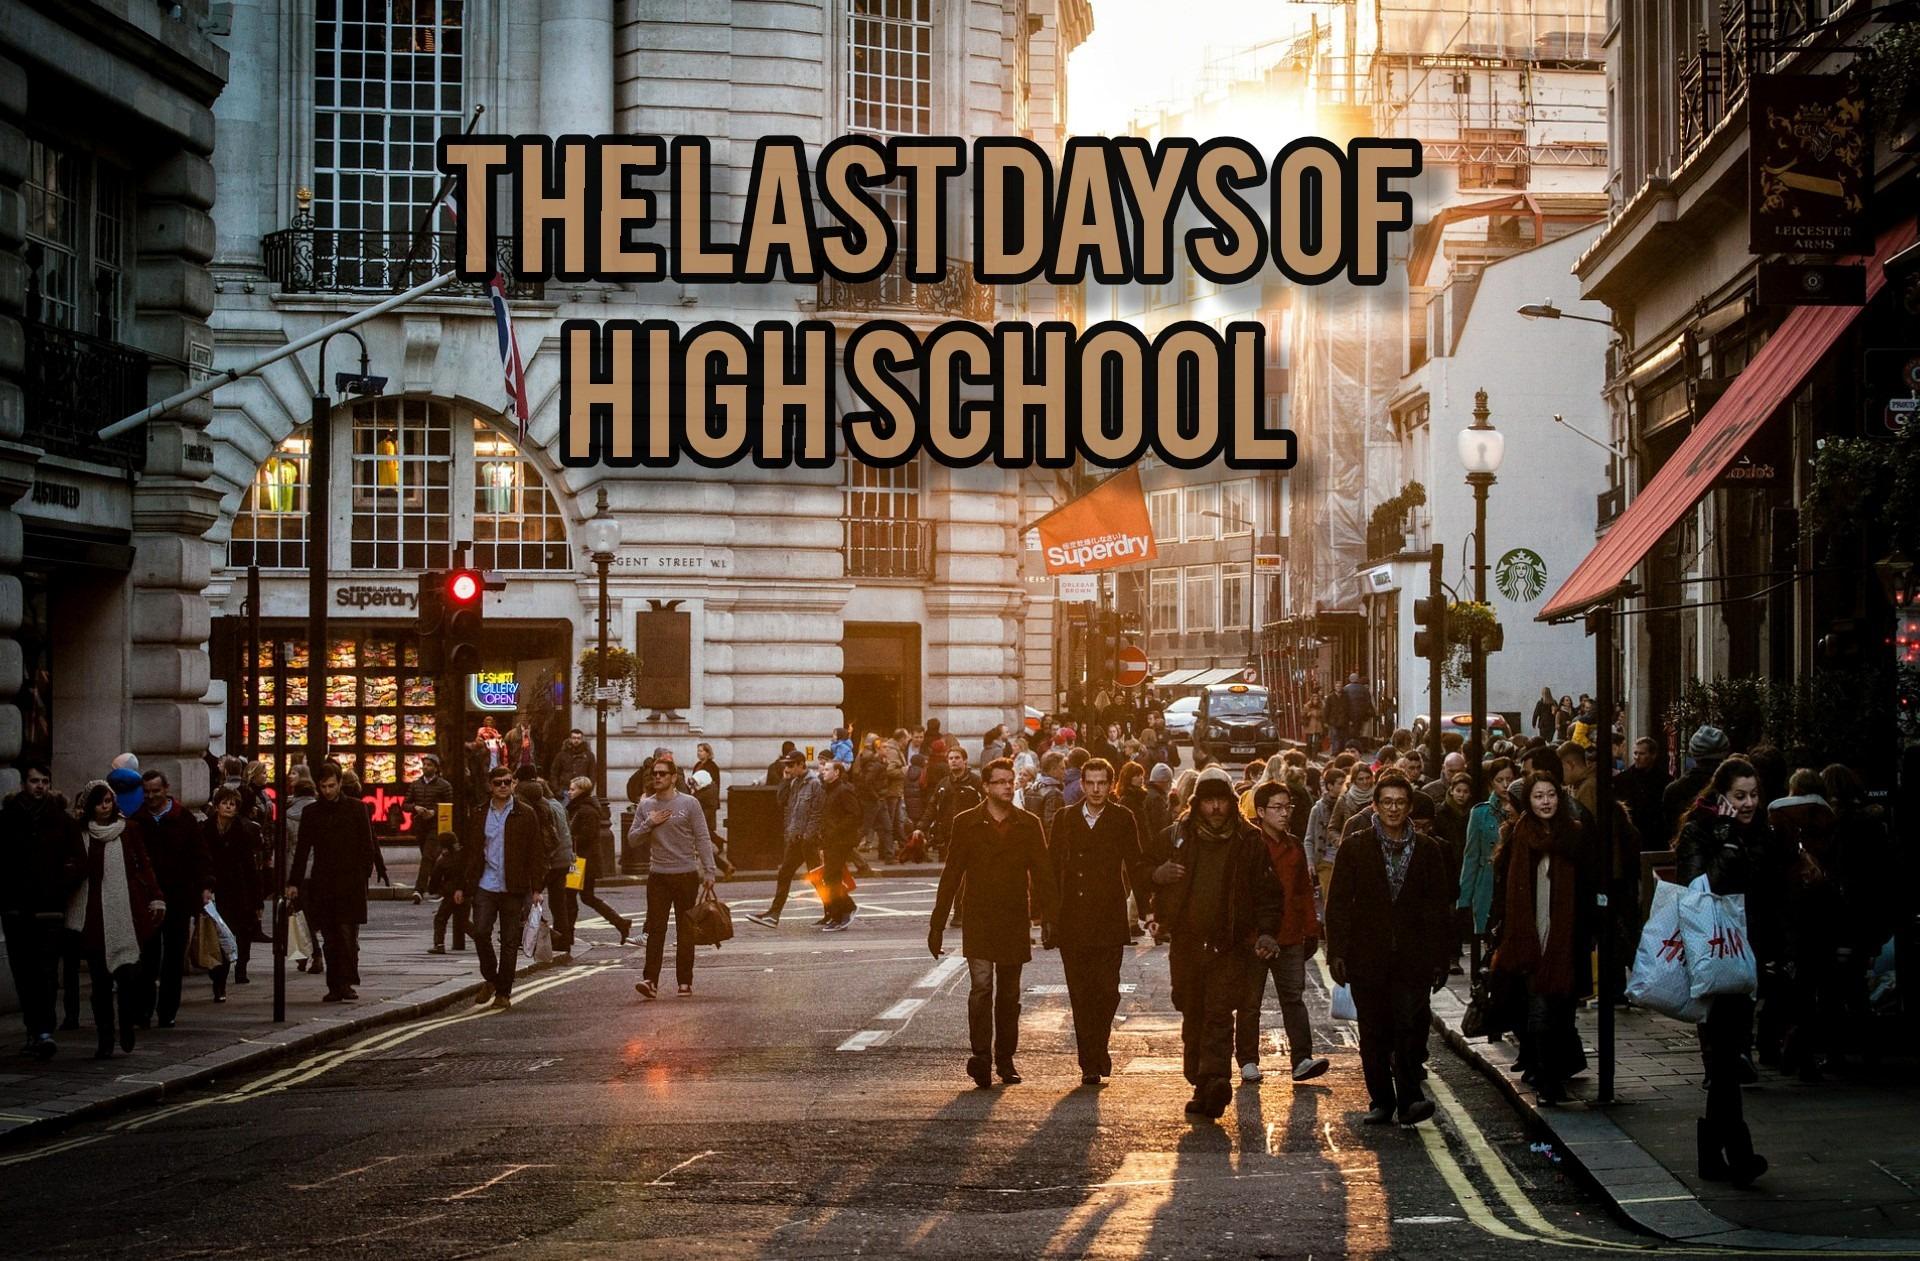 The Last Days of High school